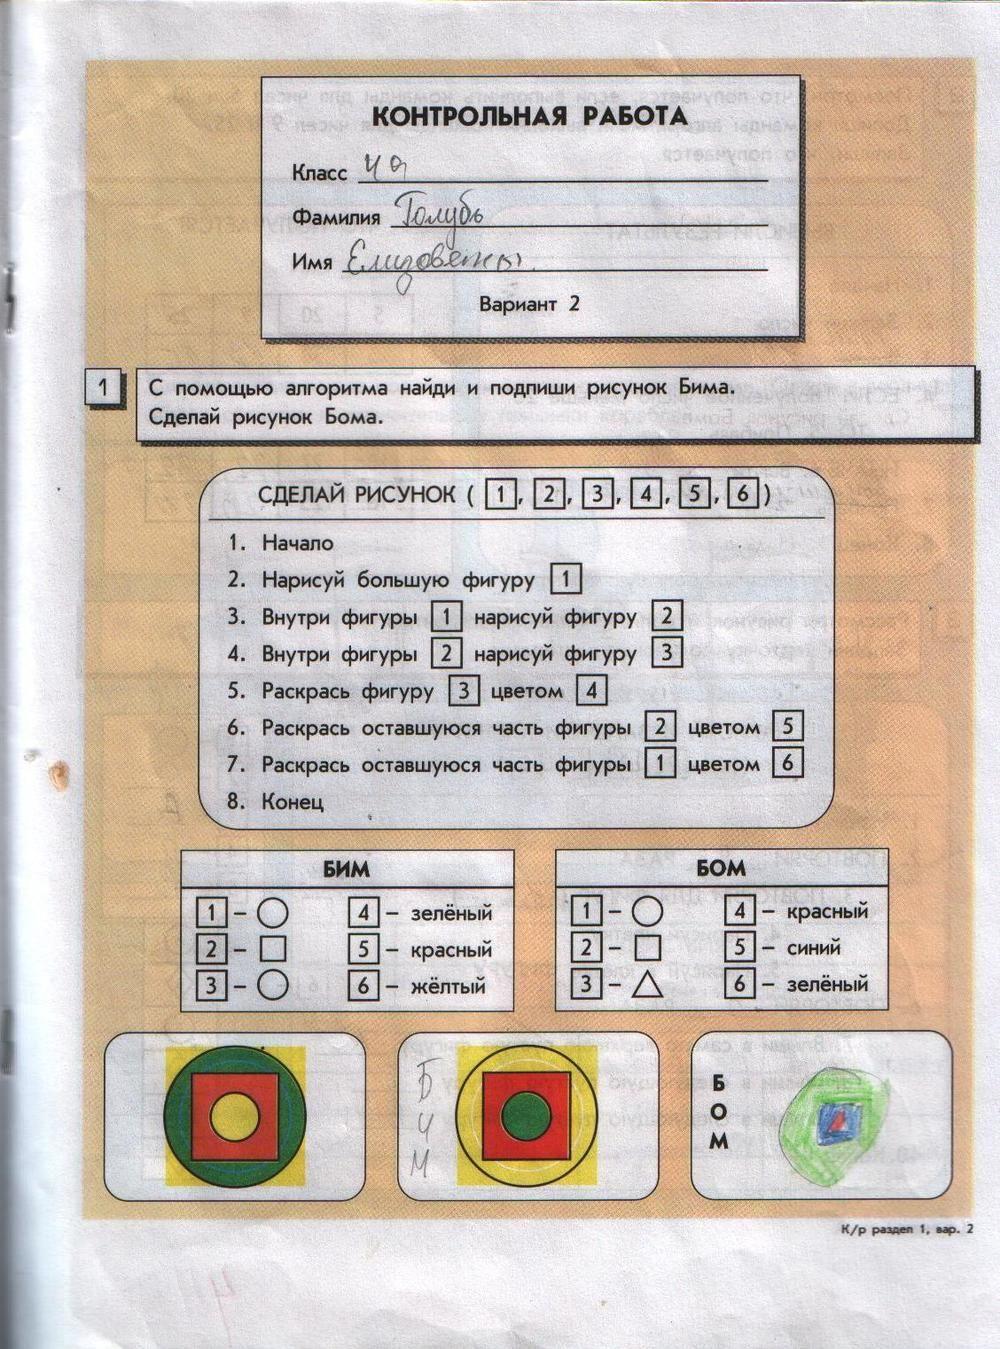 Информатика 4 класс горячев карточки